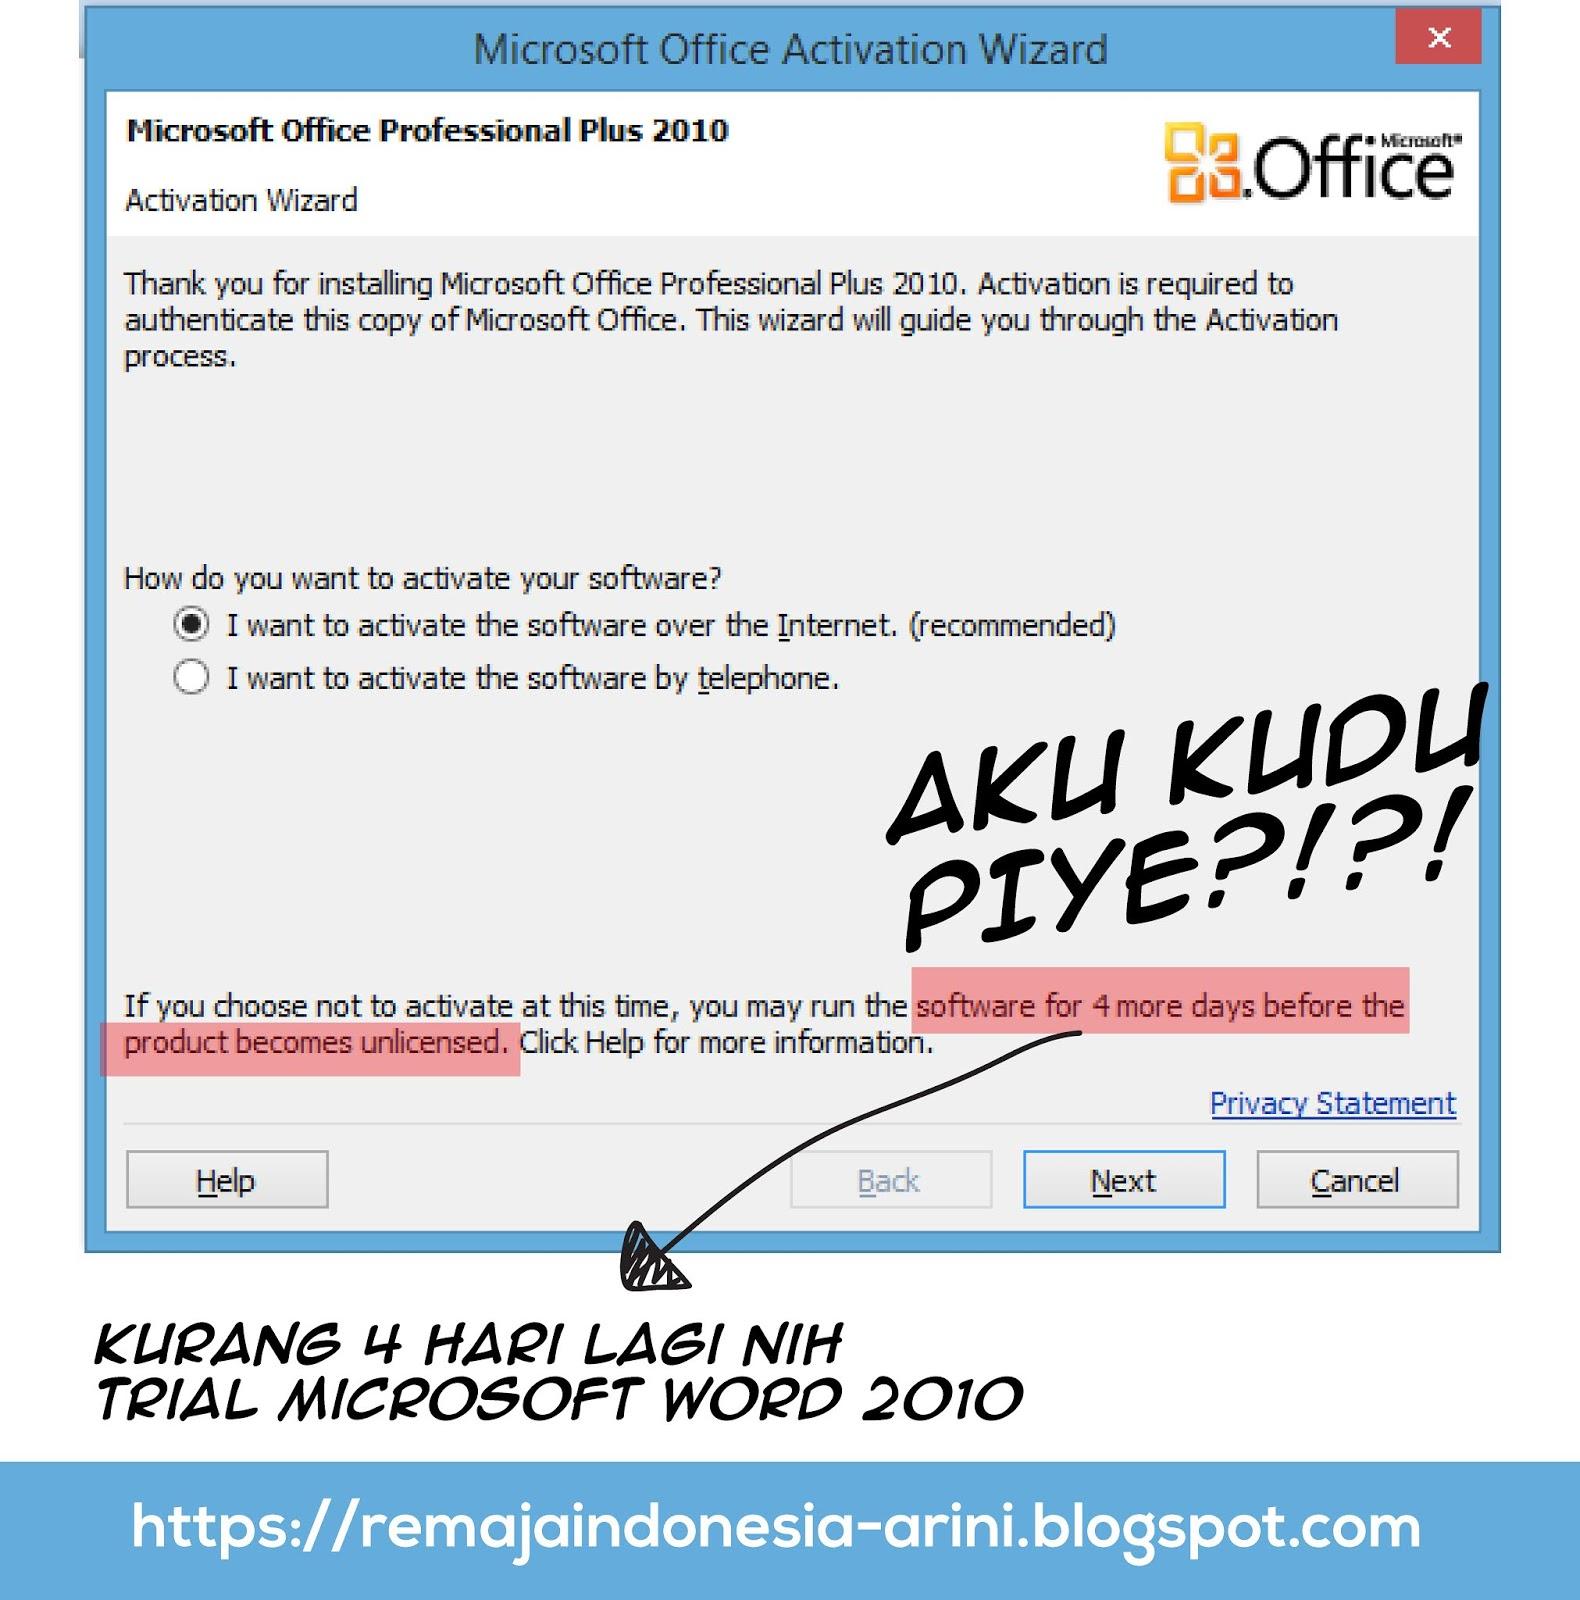 cara menghilangkan activation wizard ms office 2010